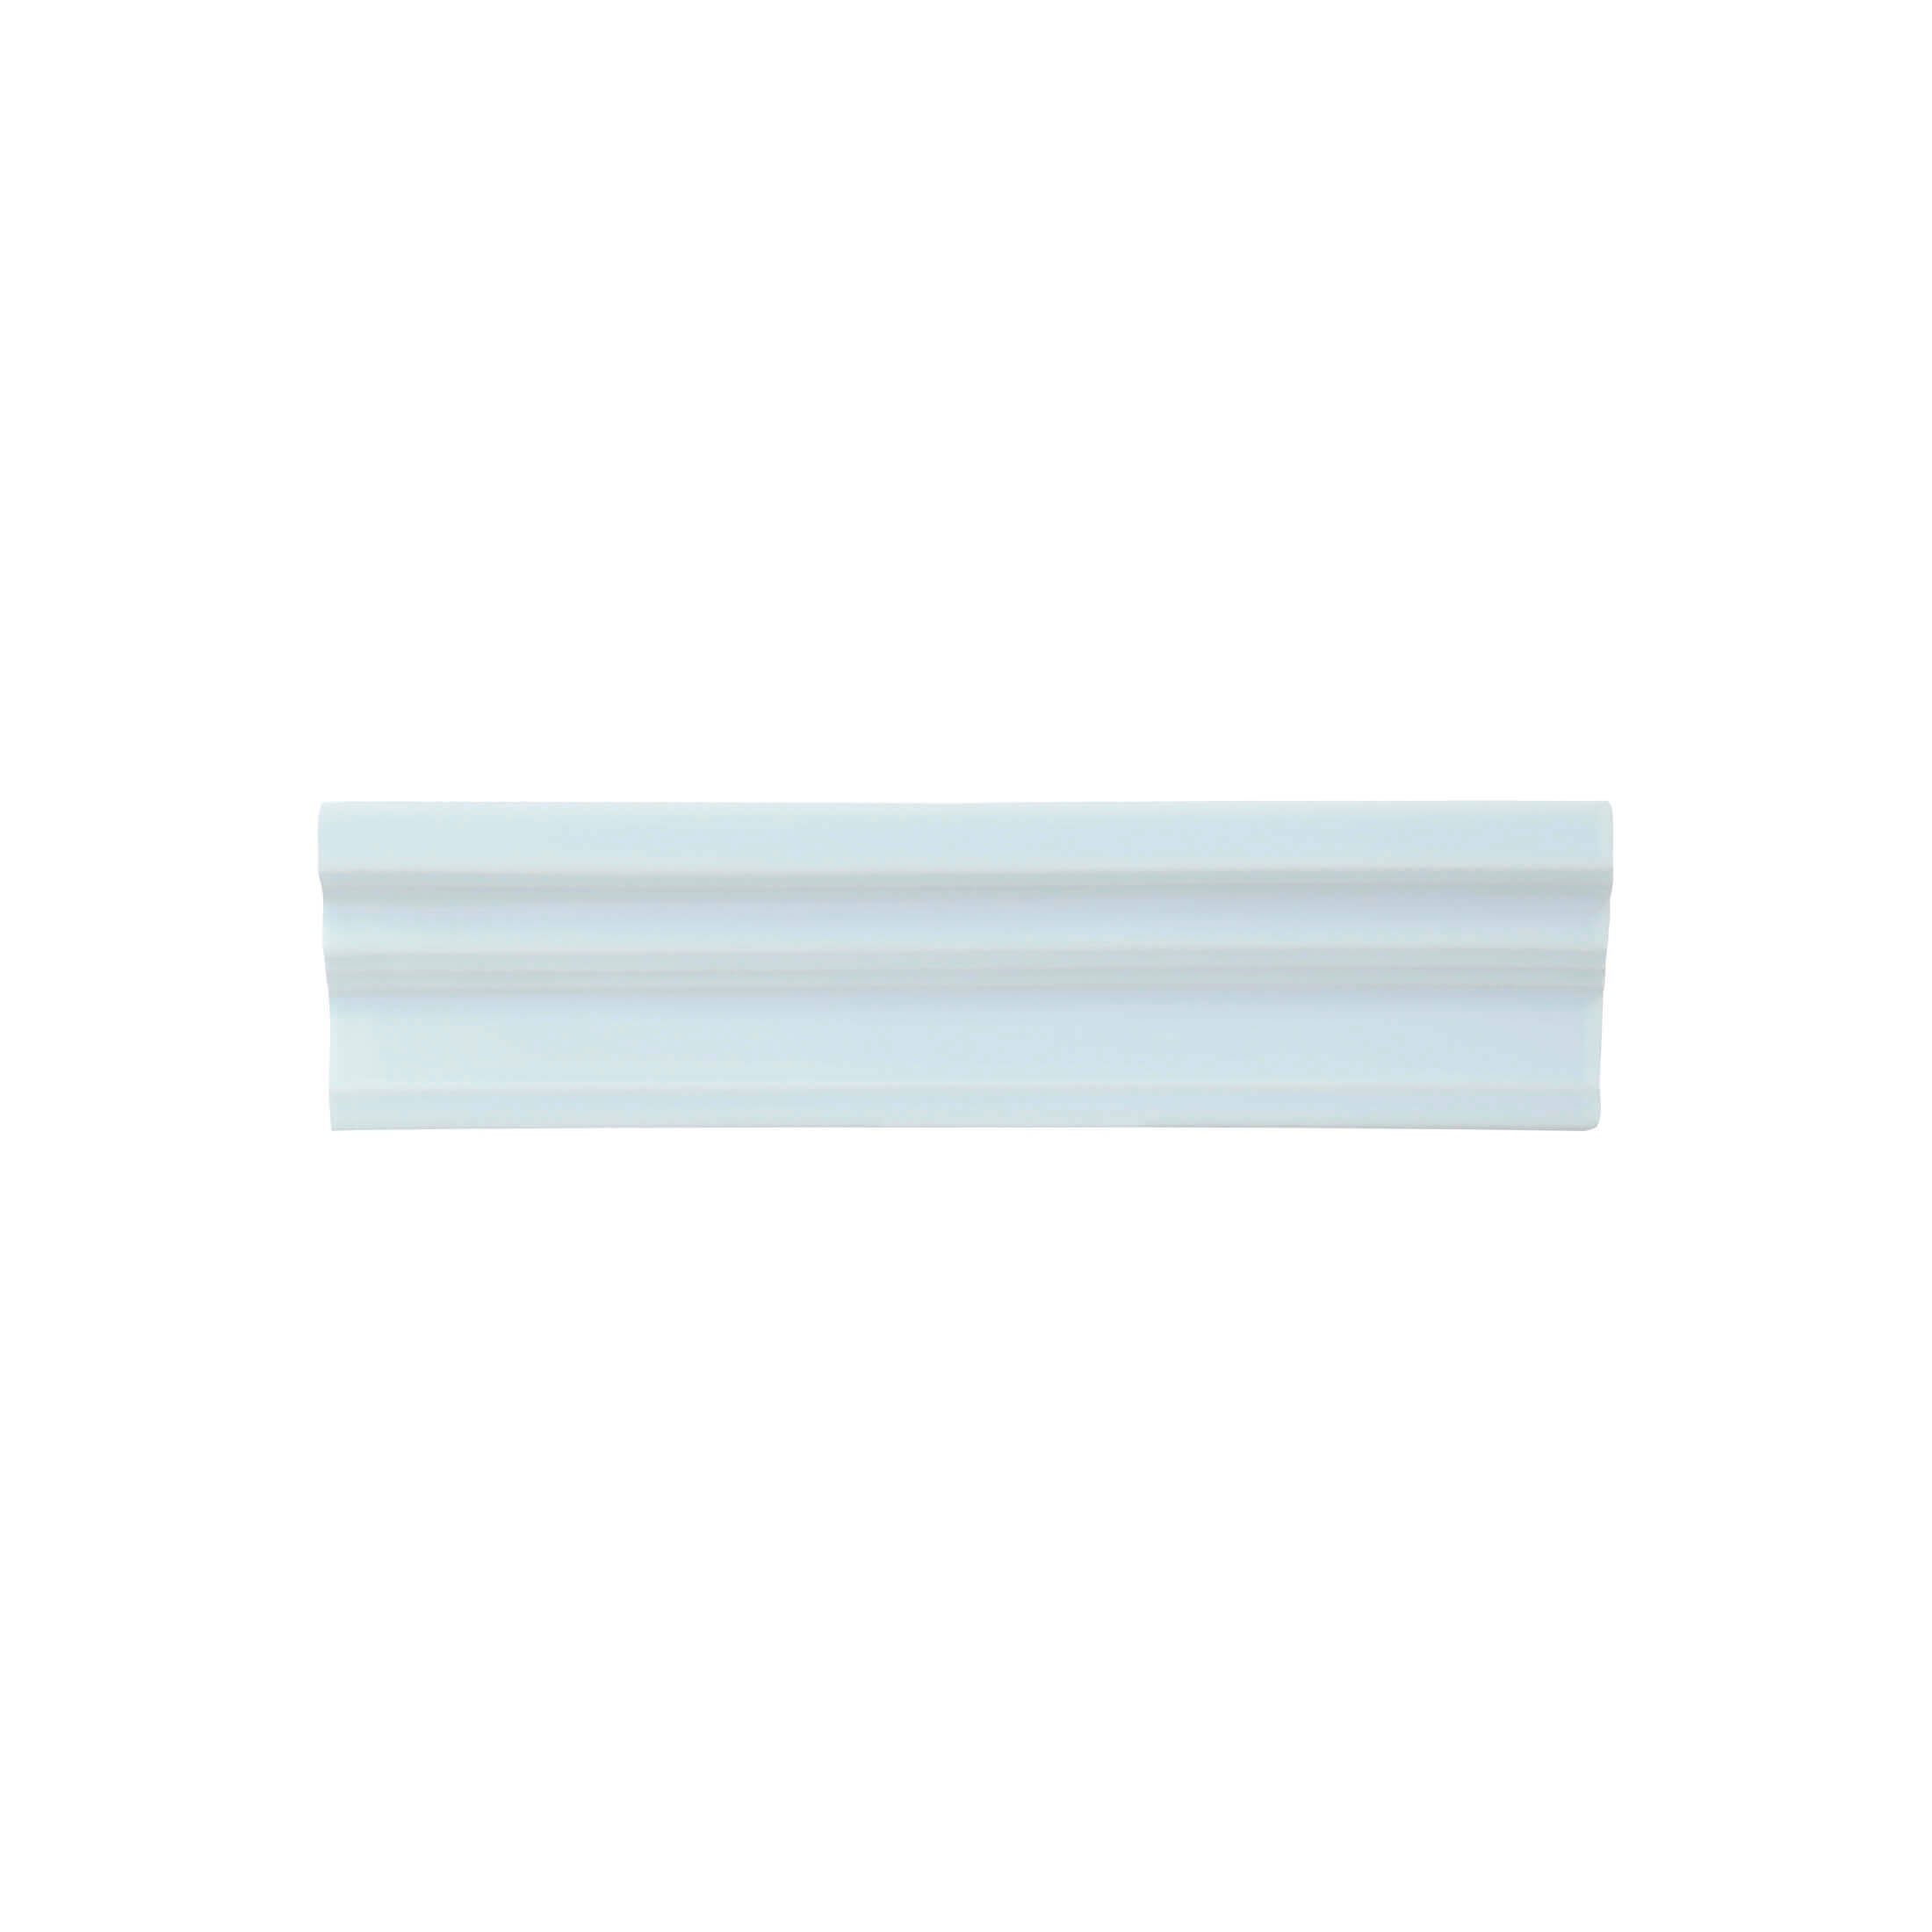 ADST5200 - CORNISA  - 5 cm X 19.8 cm